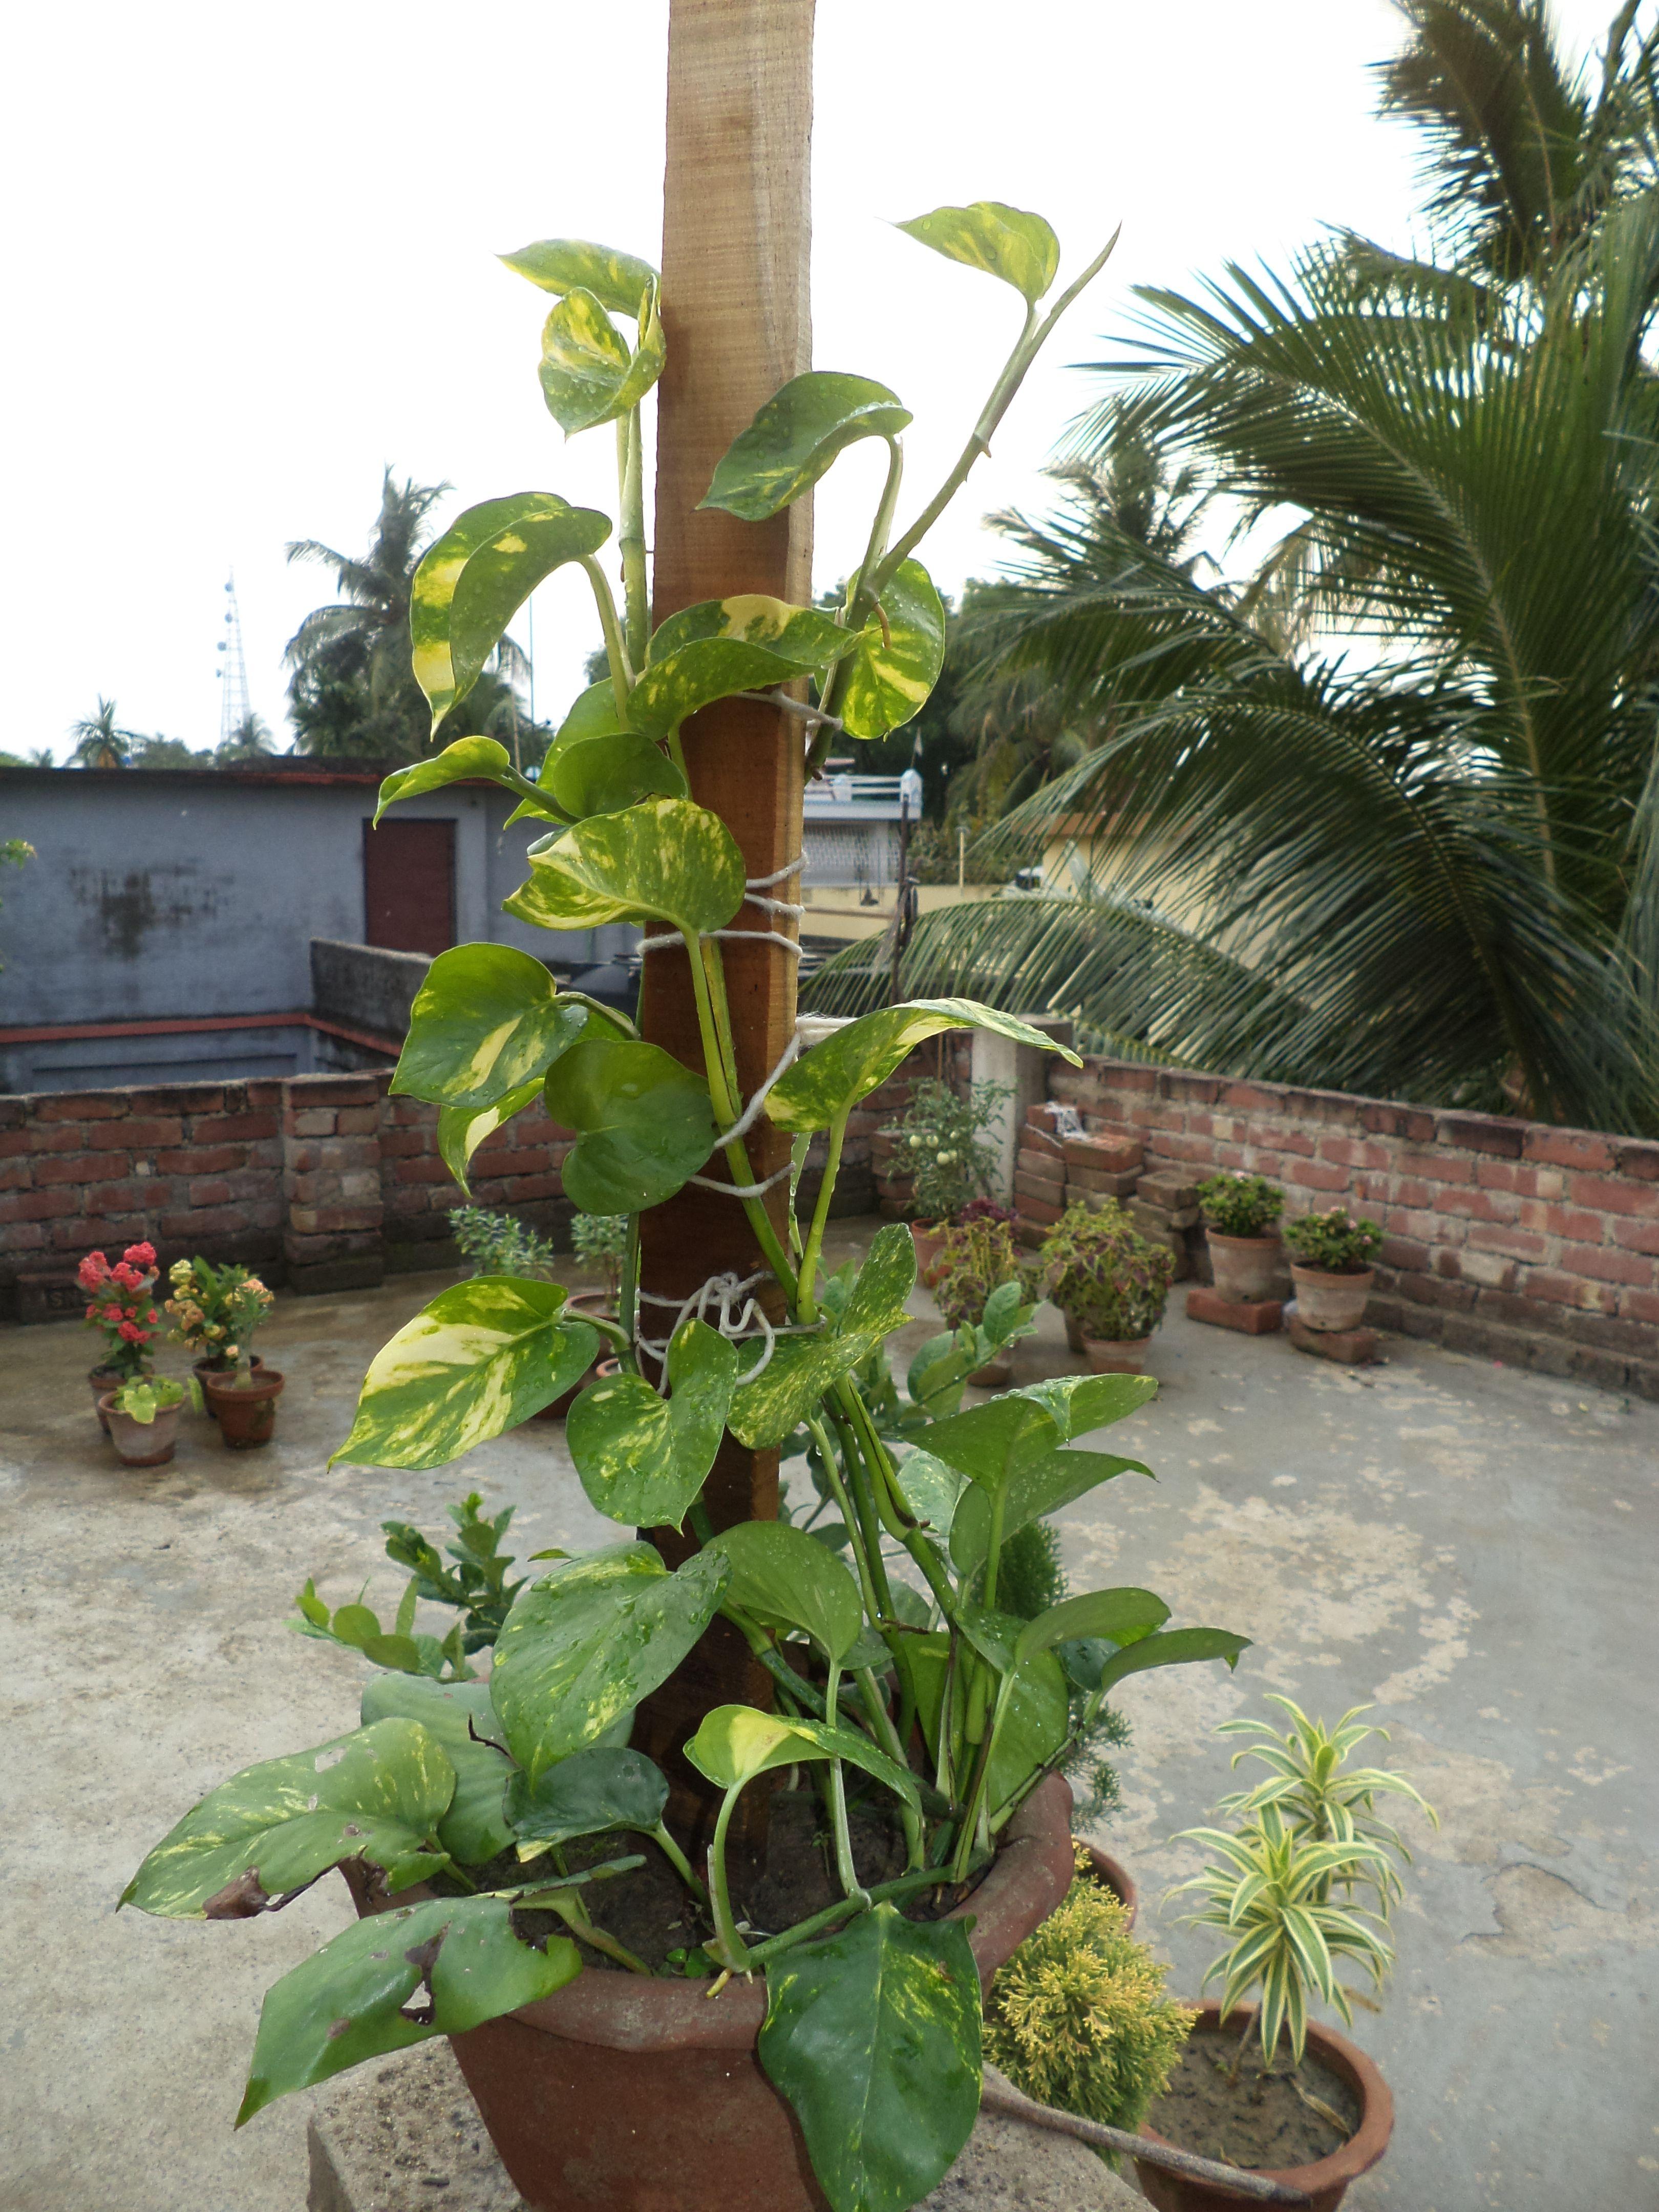 Growing Pothos (Money Plant) In A Decorative Way